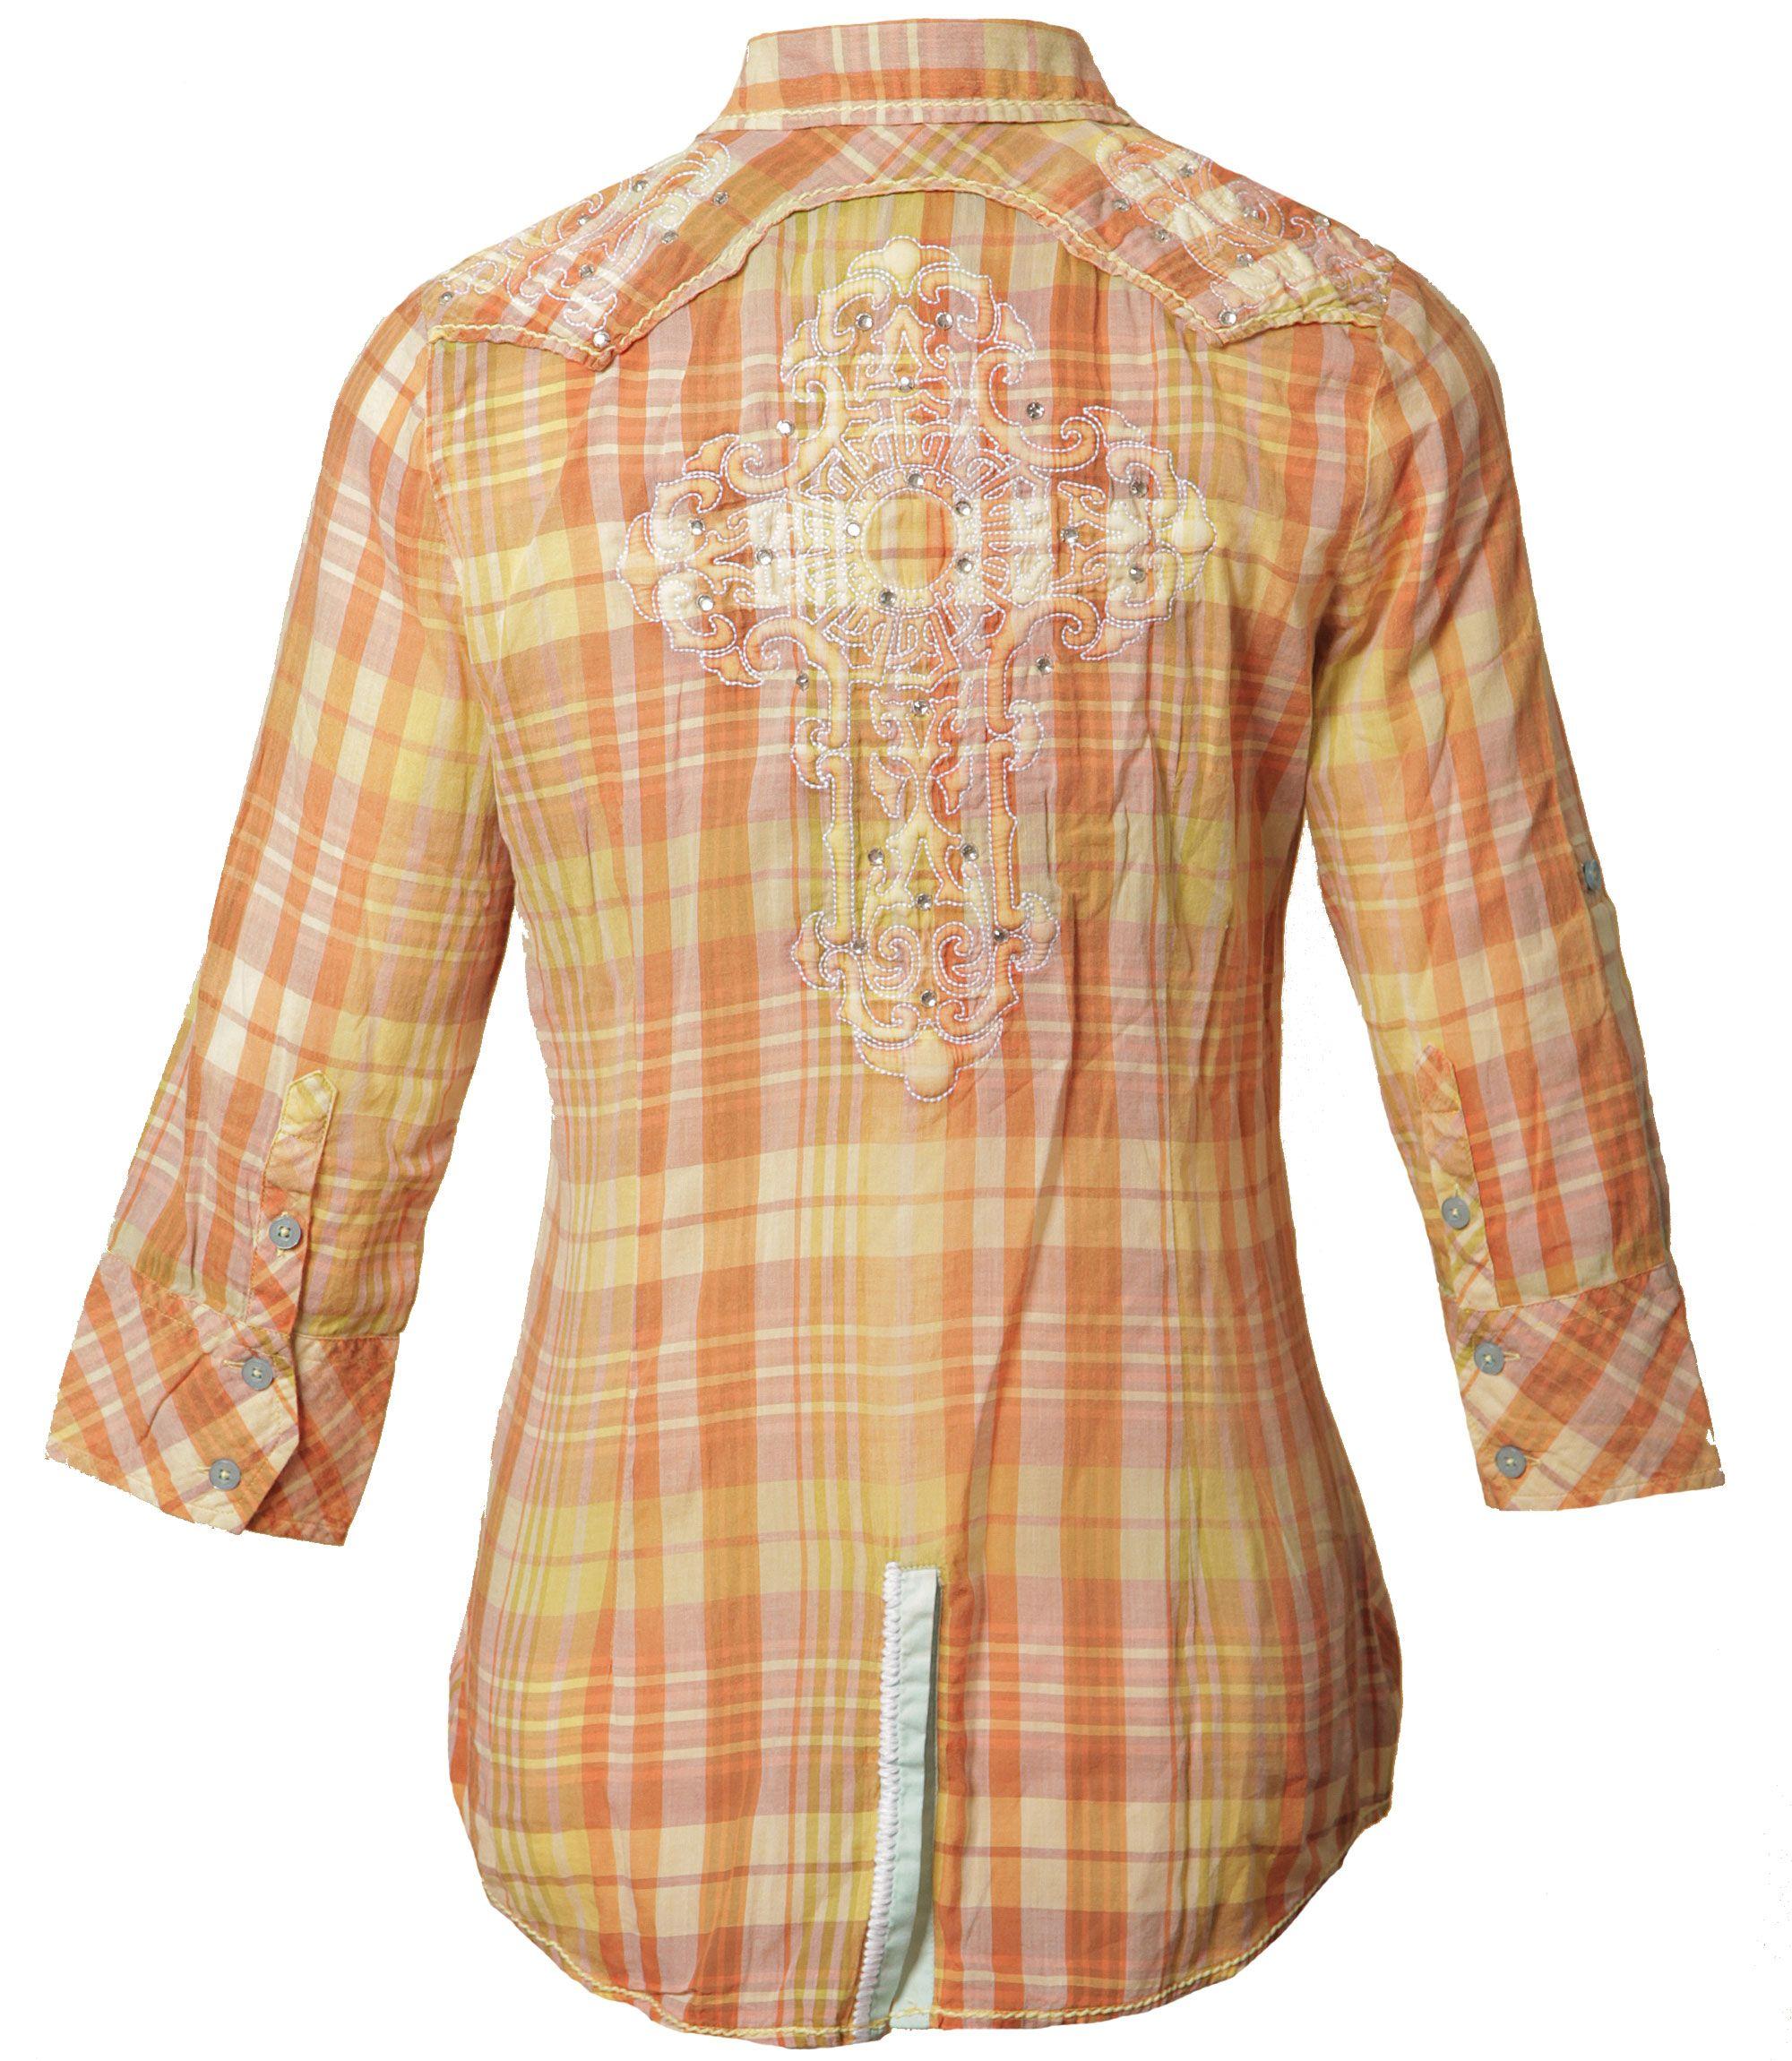 Providence mrs orange wovens roar clothing cortneyus new look